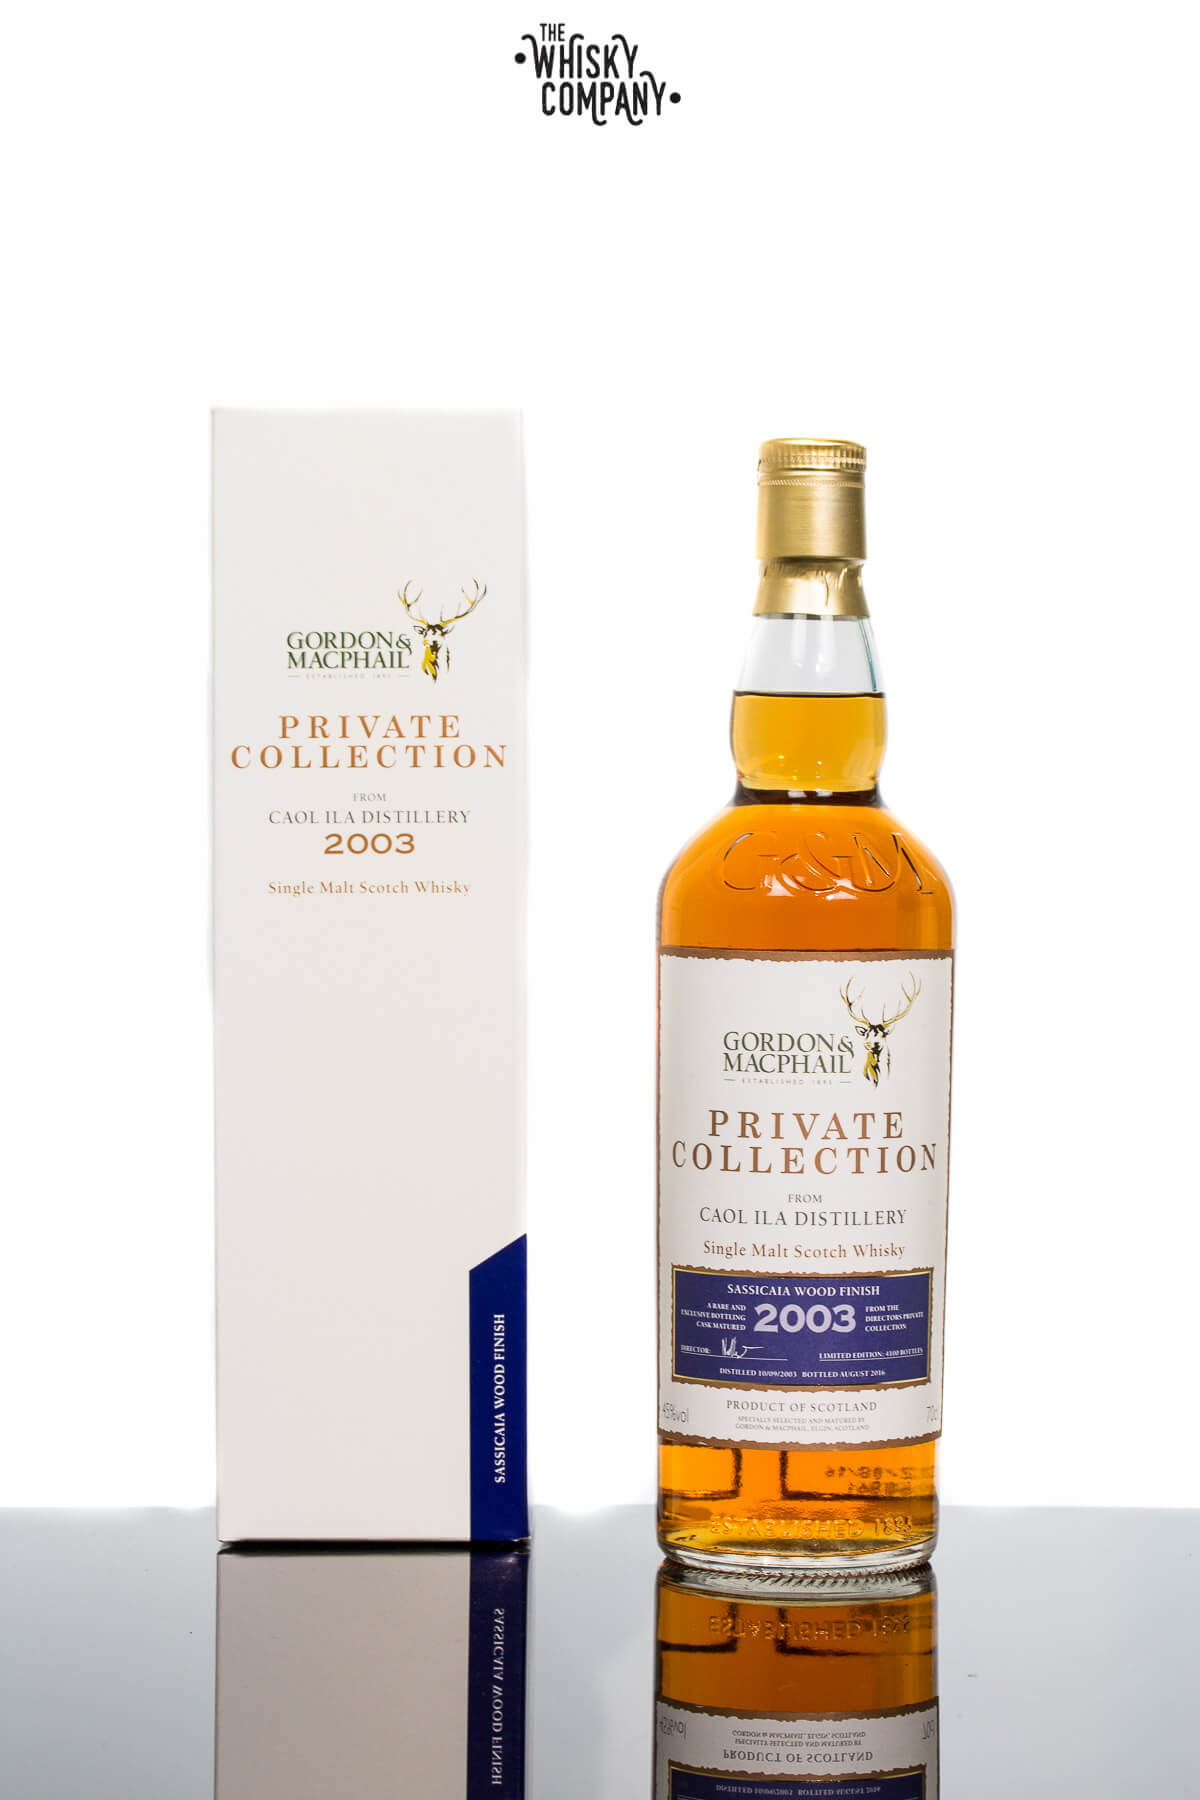 Gordon & MacPhail 2003 Caol Ila Sassicaia Wood Islay Single Malt Scotch Whisky (700ml)